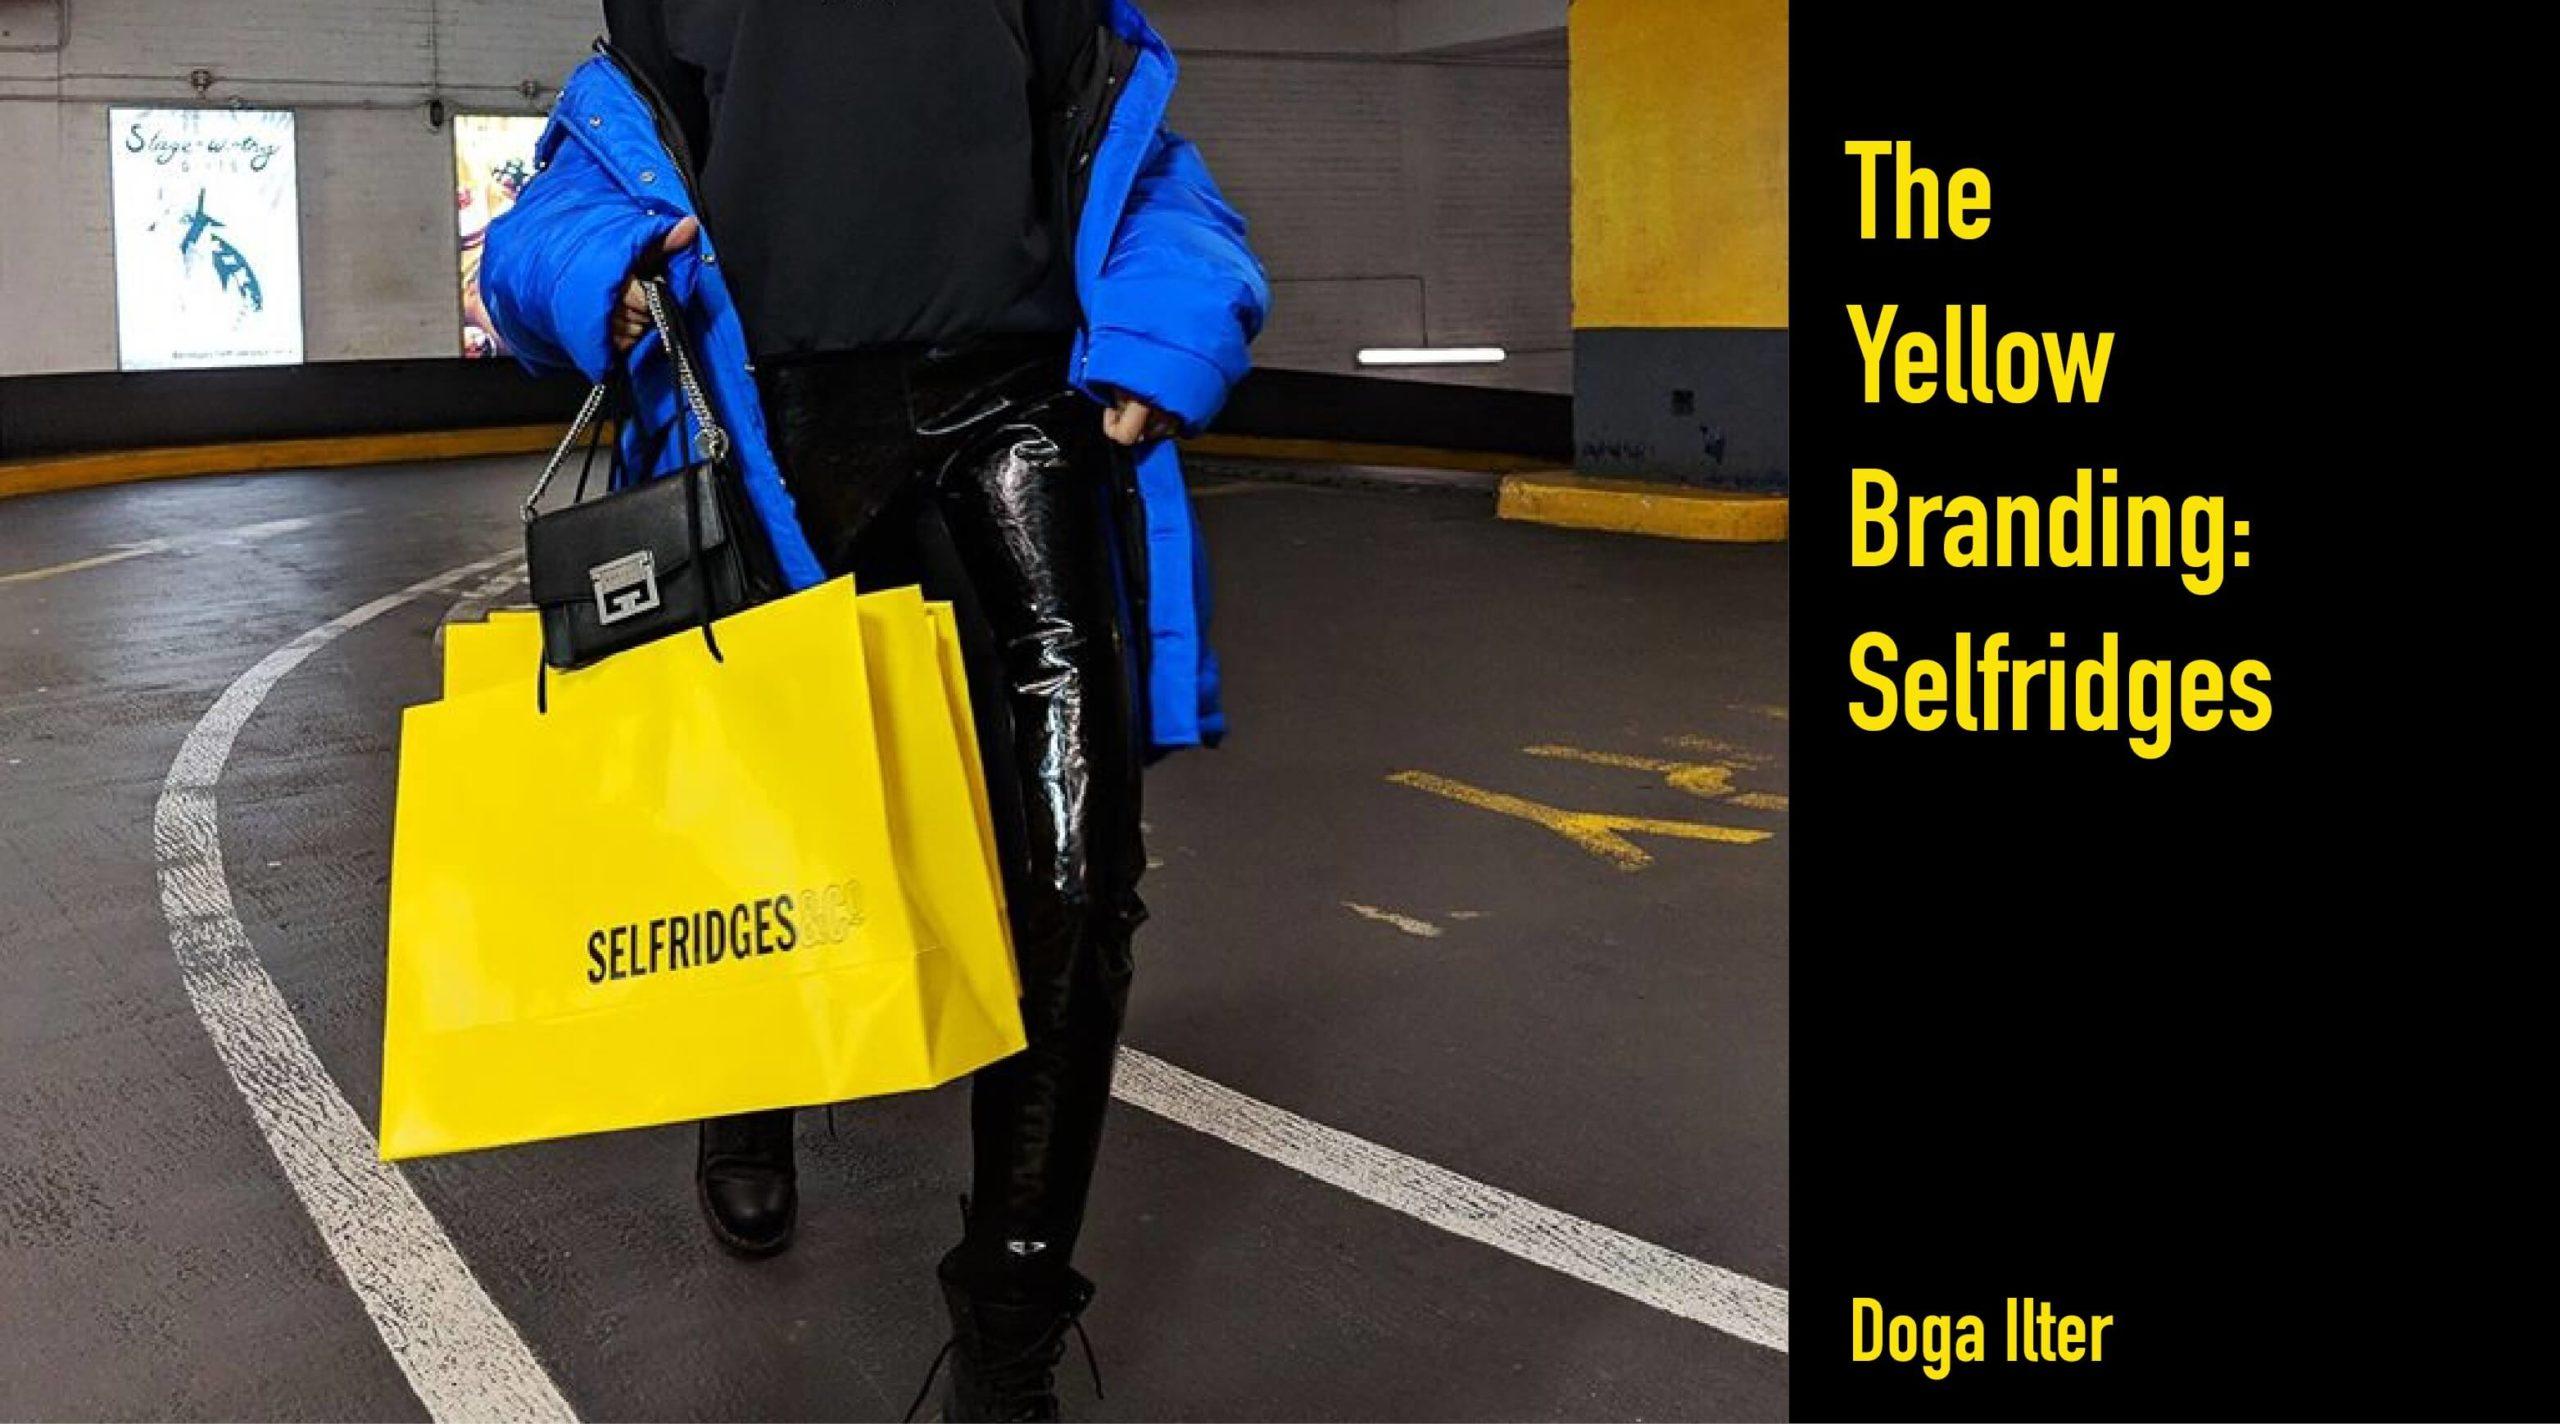 The Yellow Branding: Selfridges